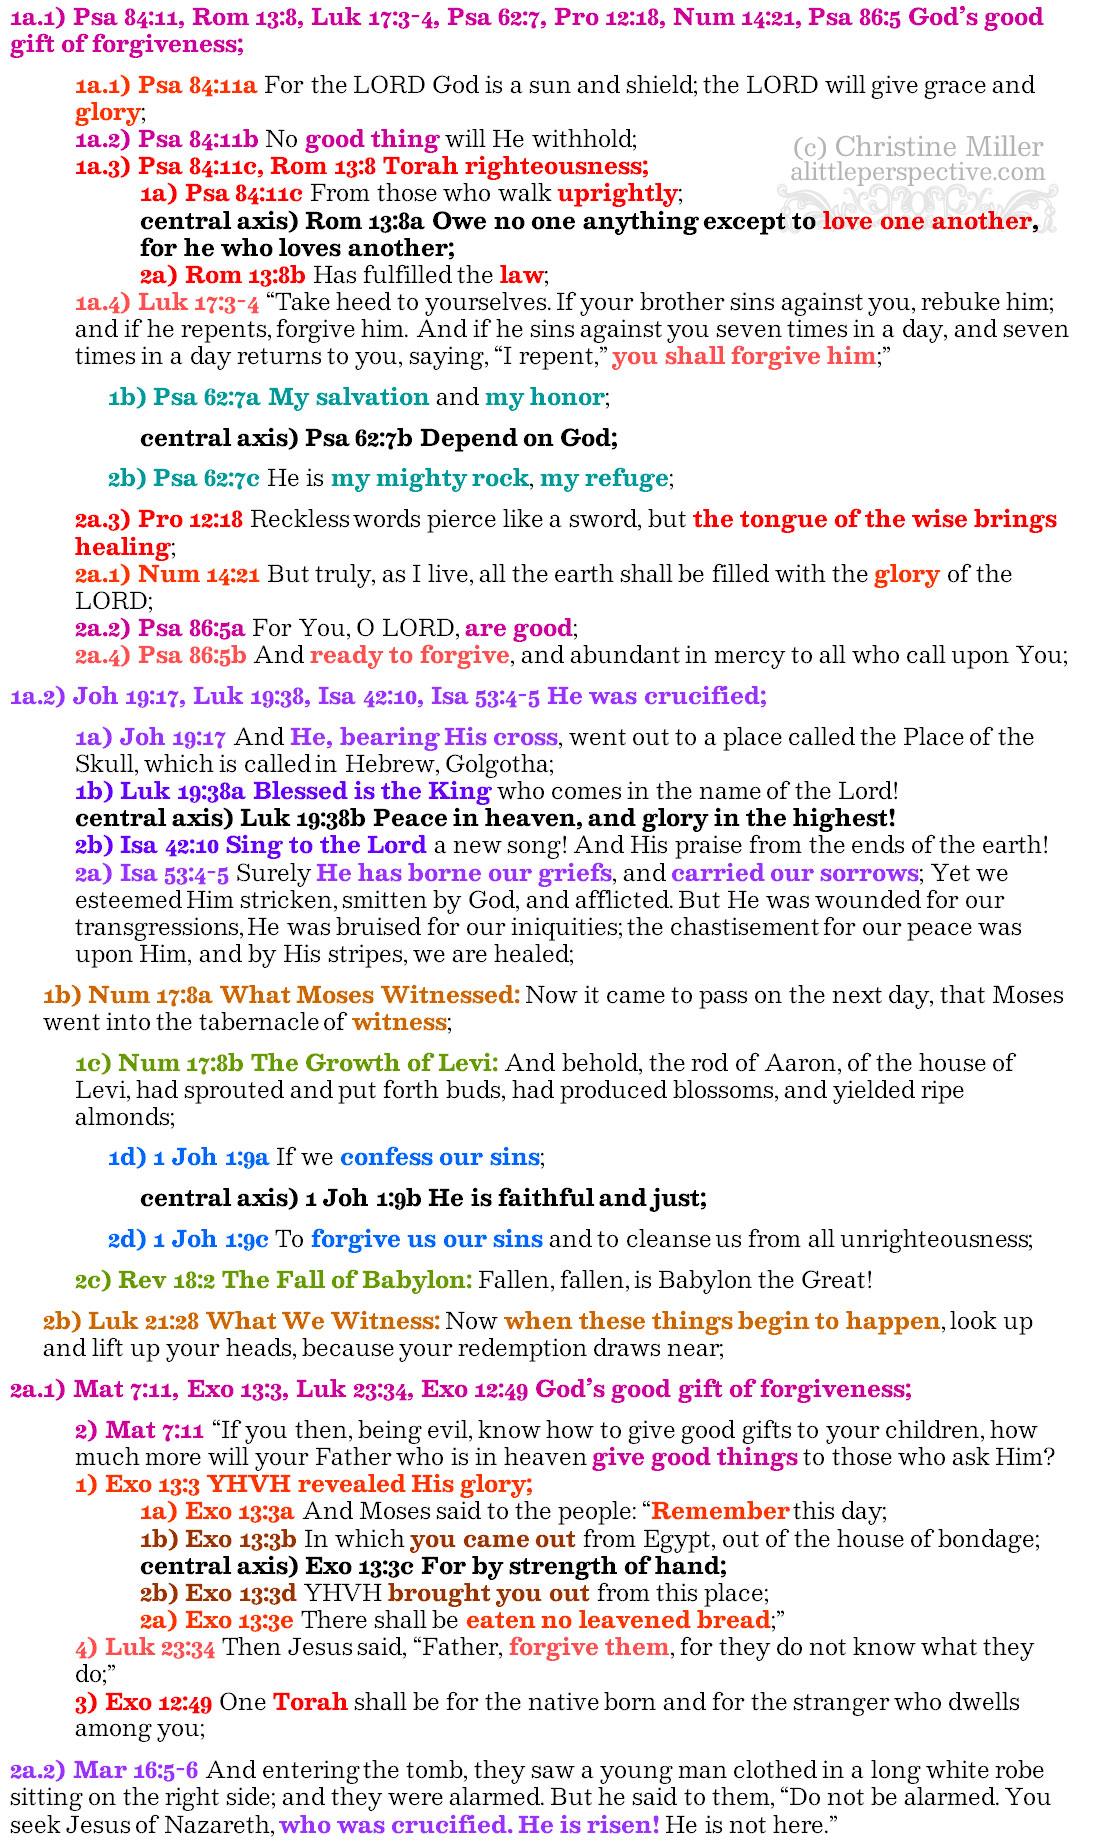 Shabbat Prophetic chiasm for Apr 01 2018 | alittleperspective.com